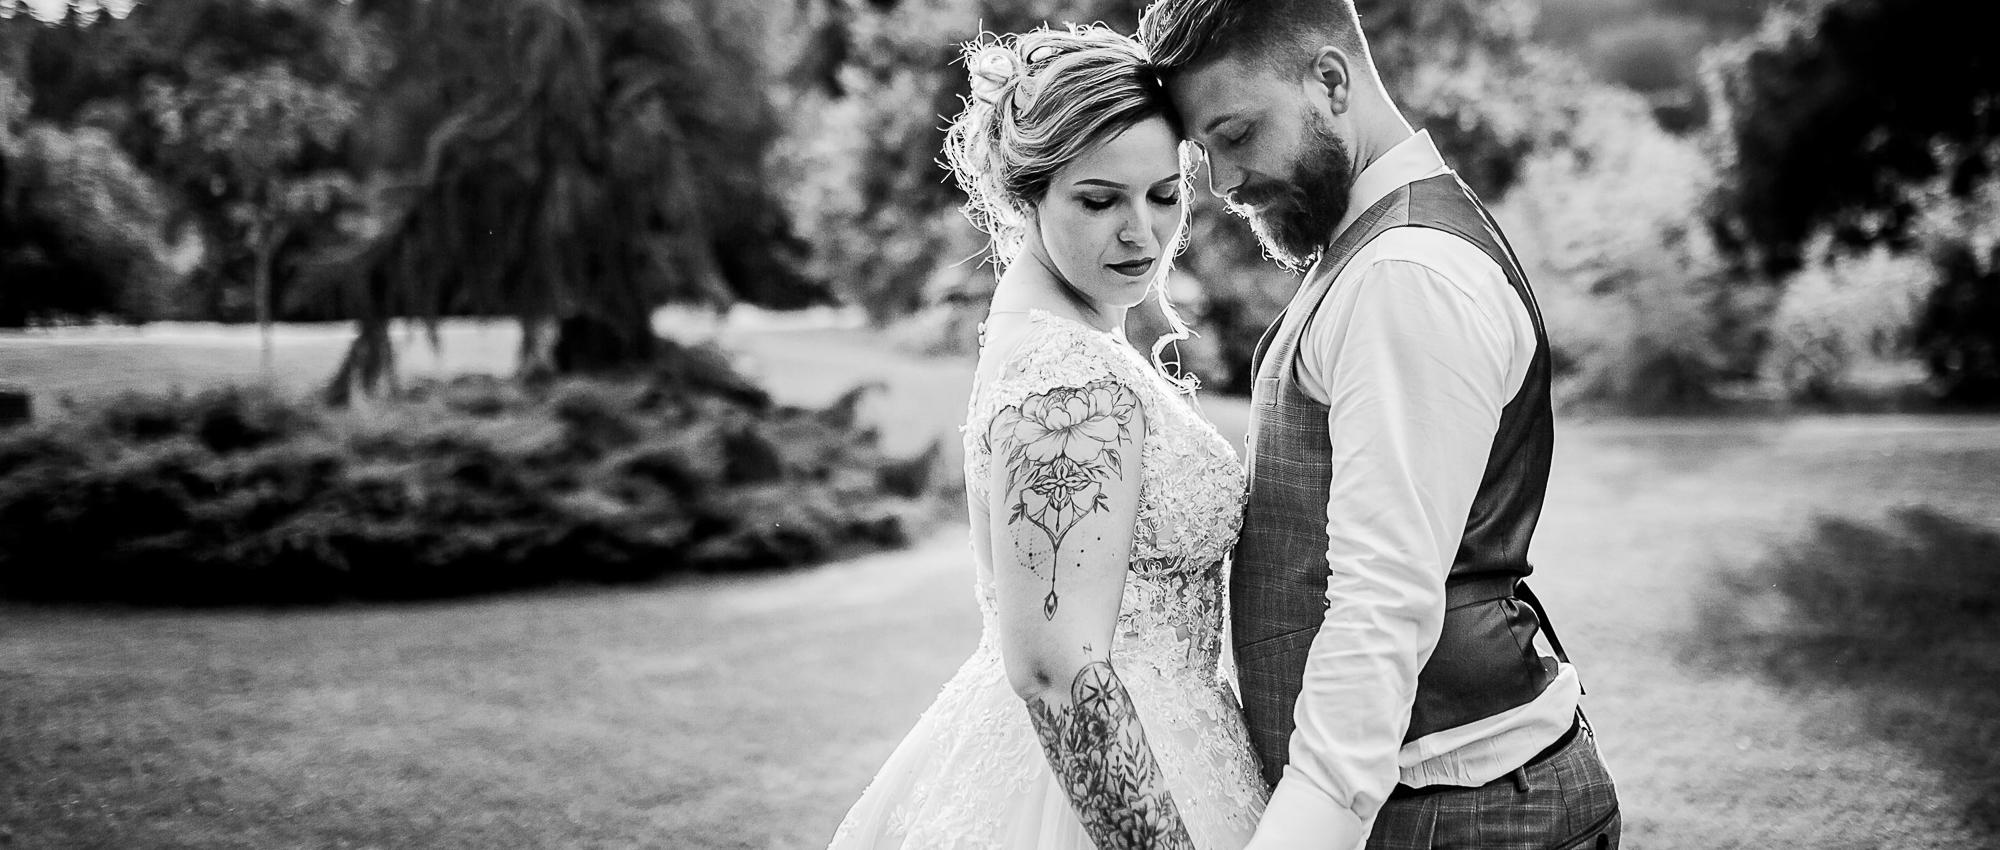 mariage-champetre-domaine-feyel-photo-babouchkatelier- (178)